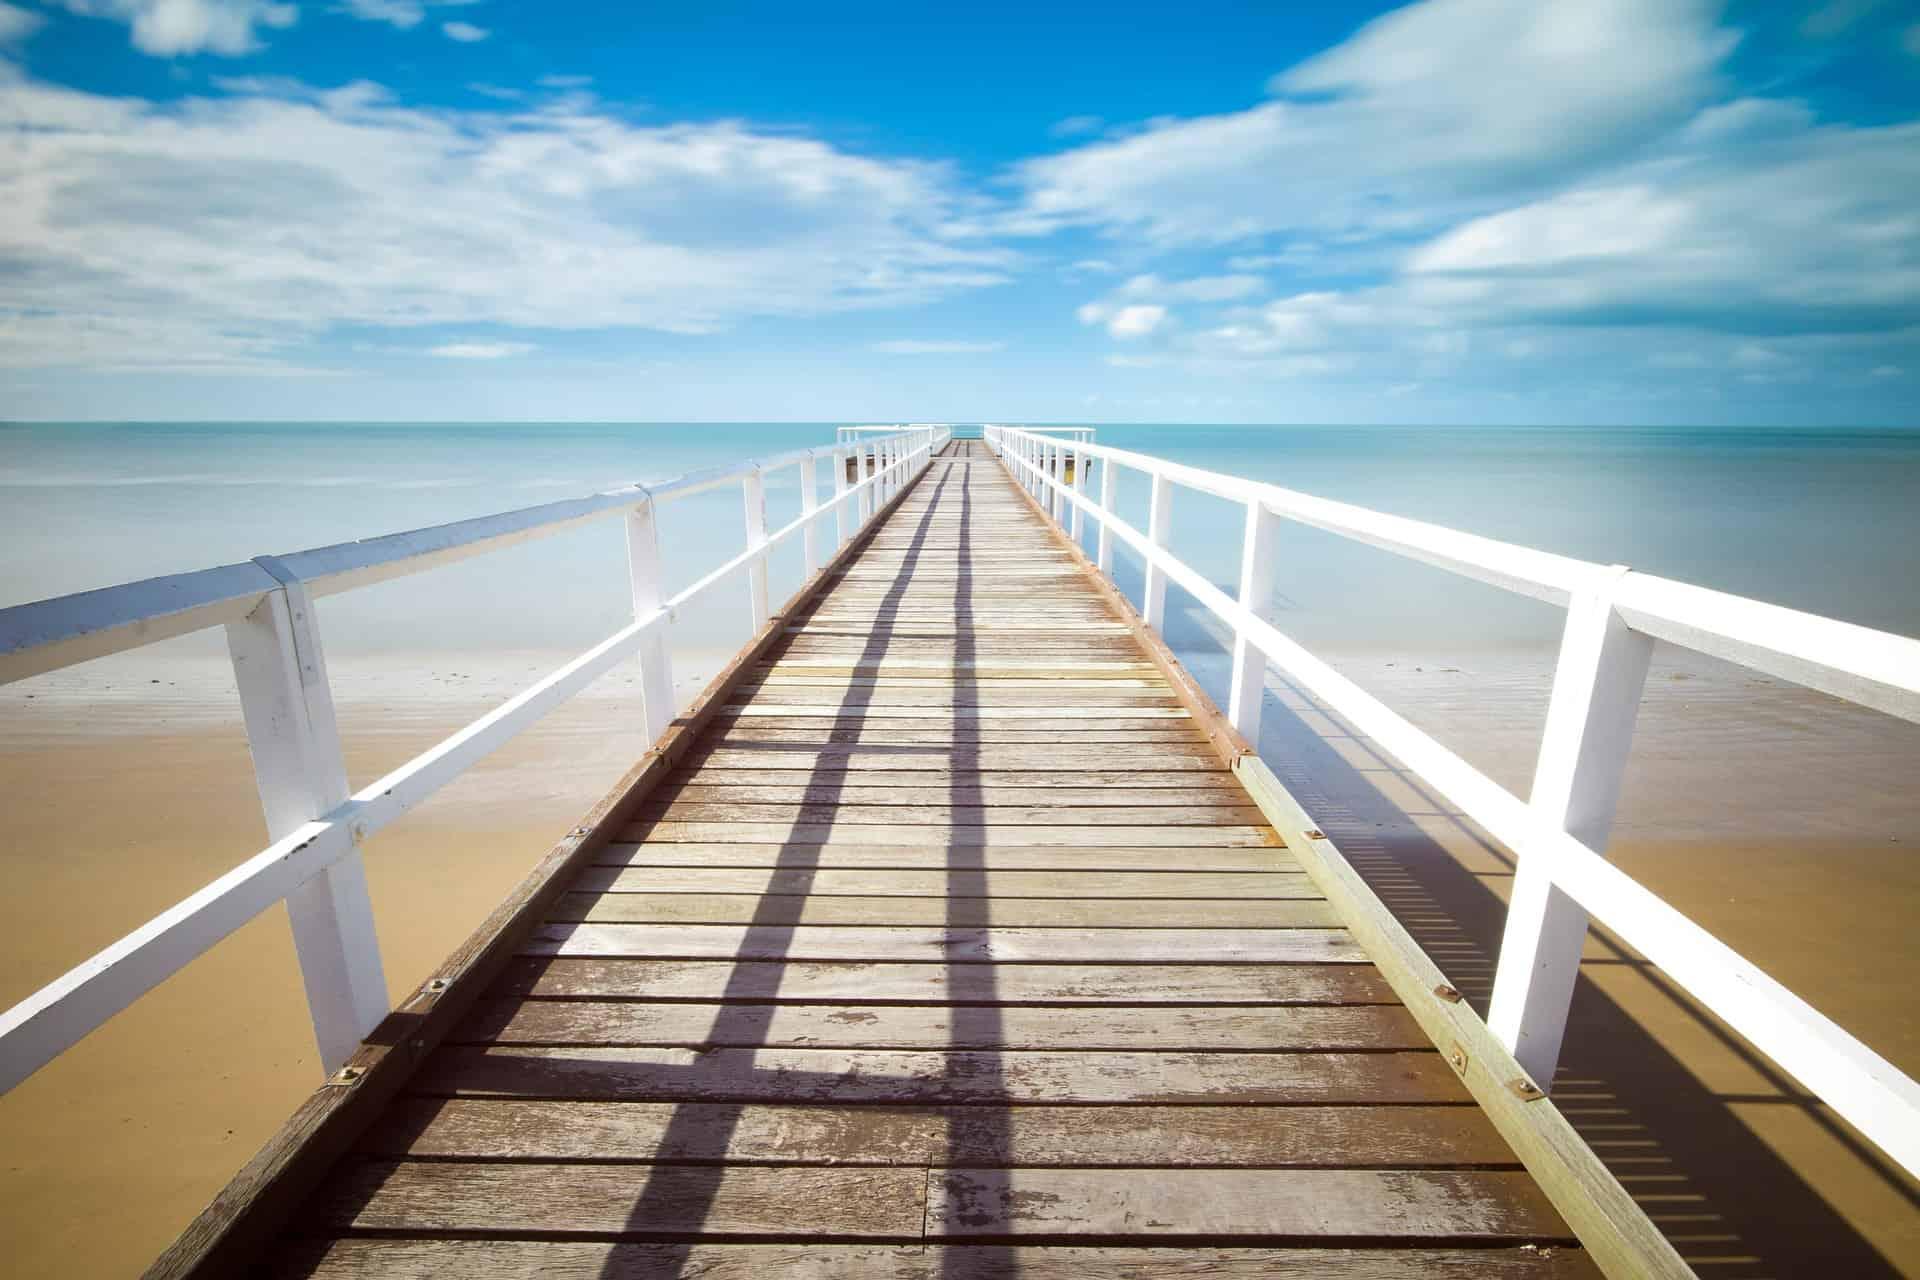 Nordseeurlaub: Ebbe, Flut und Inselträume